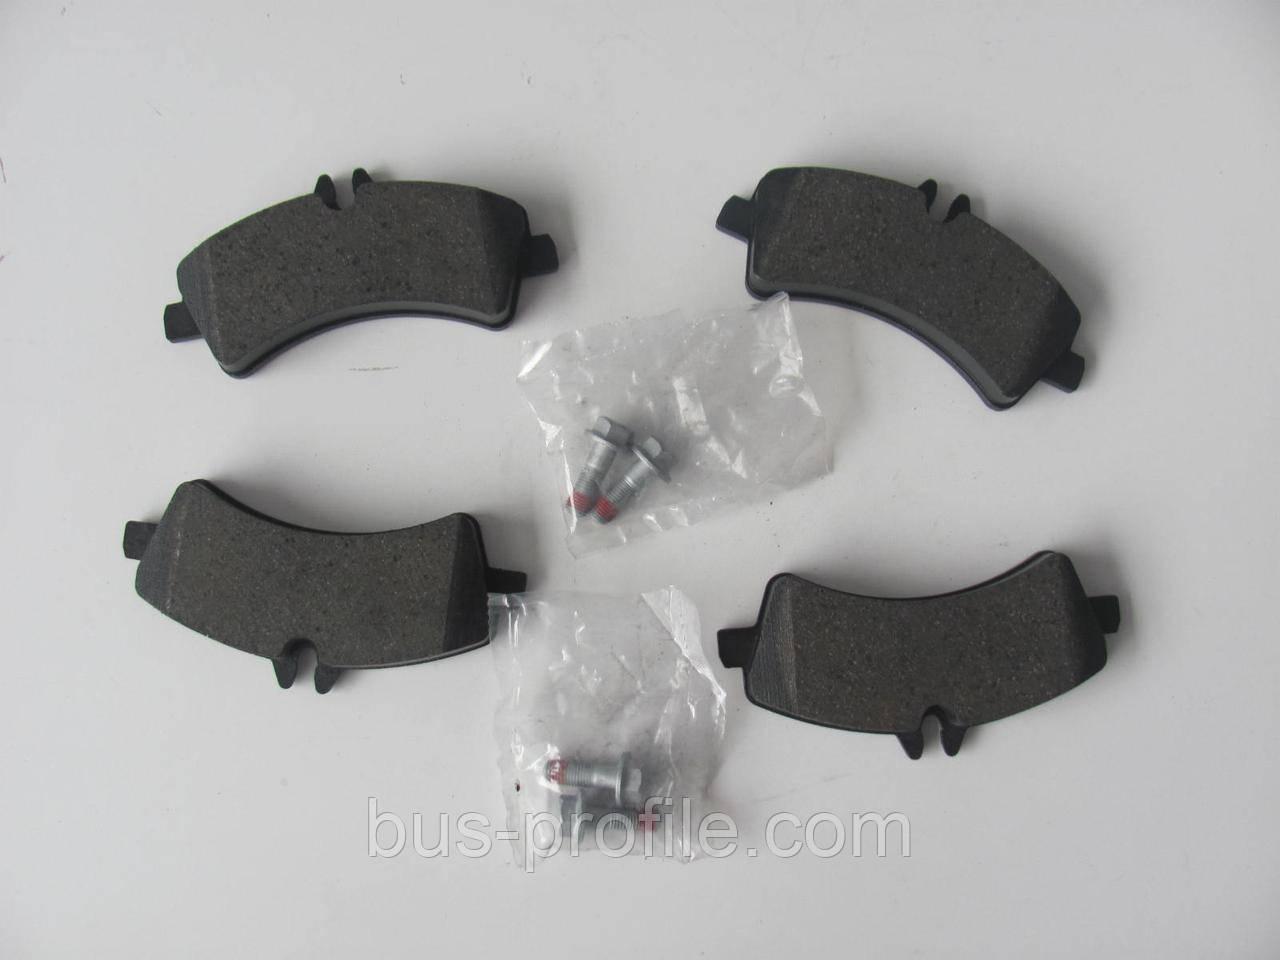 Колодки тормозные задние MB Sprinter 509-519 CDI/VW Crafter 50 (спарка) — FTE — BL2011A4